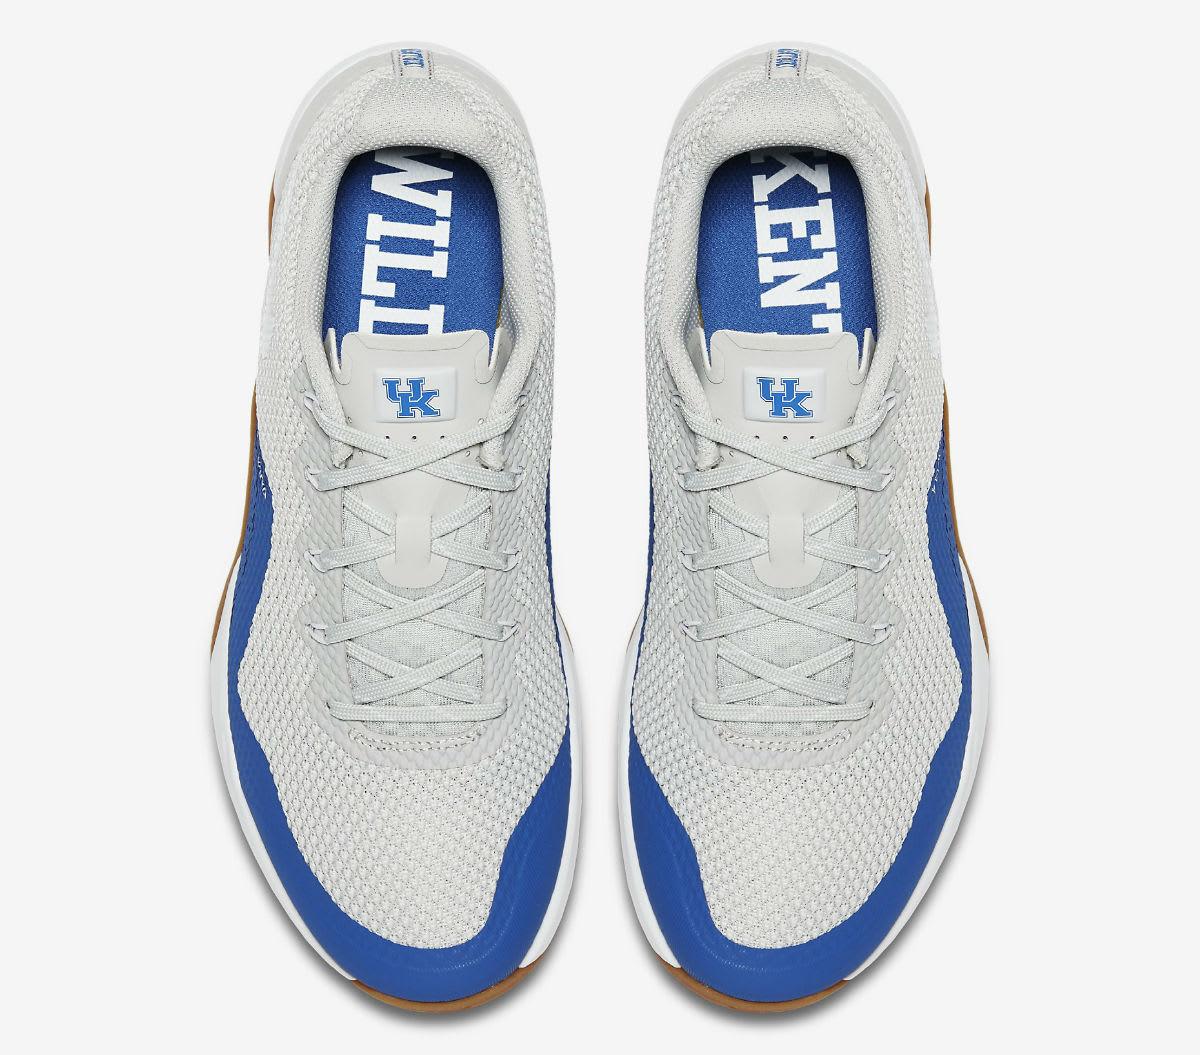 Nike Metcon Repper DSX Kentucky Release Date (2)